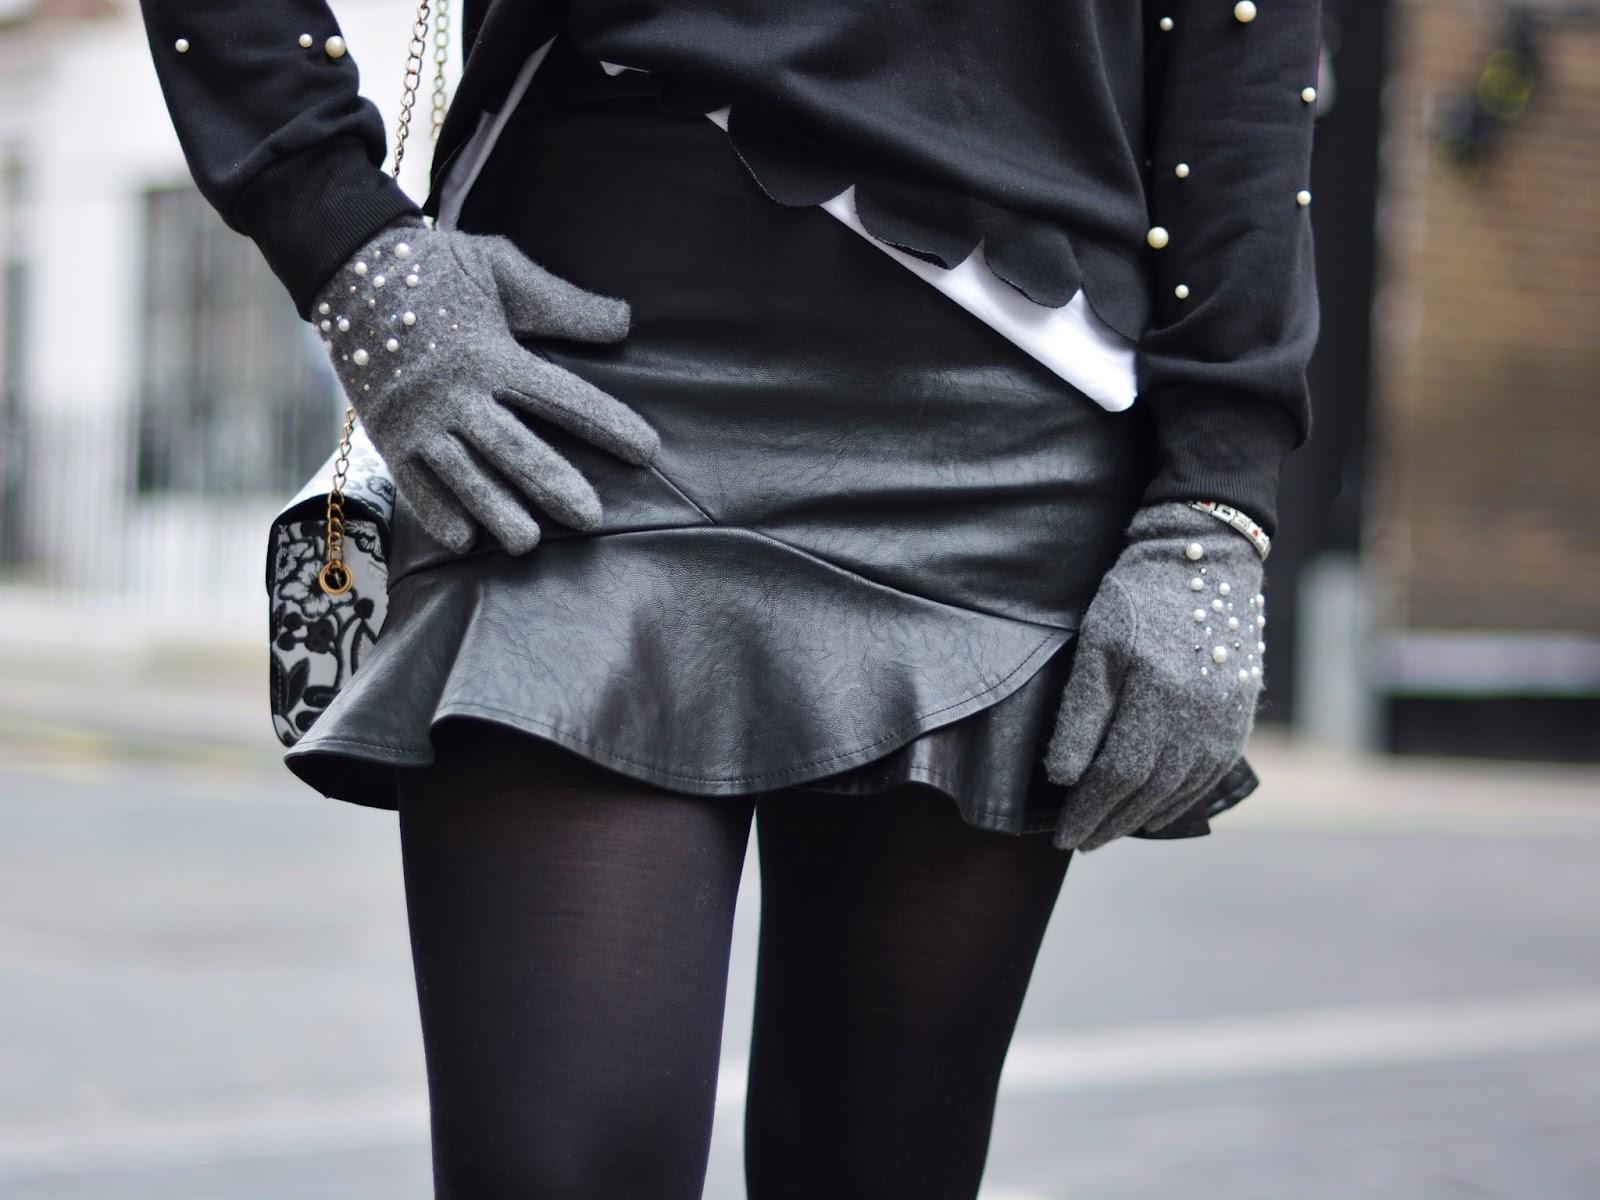 czarna skórzana spódniczka